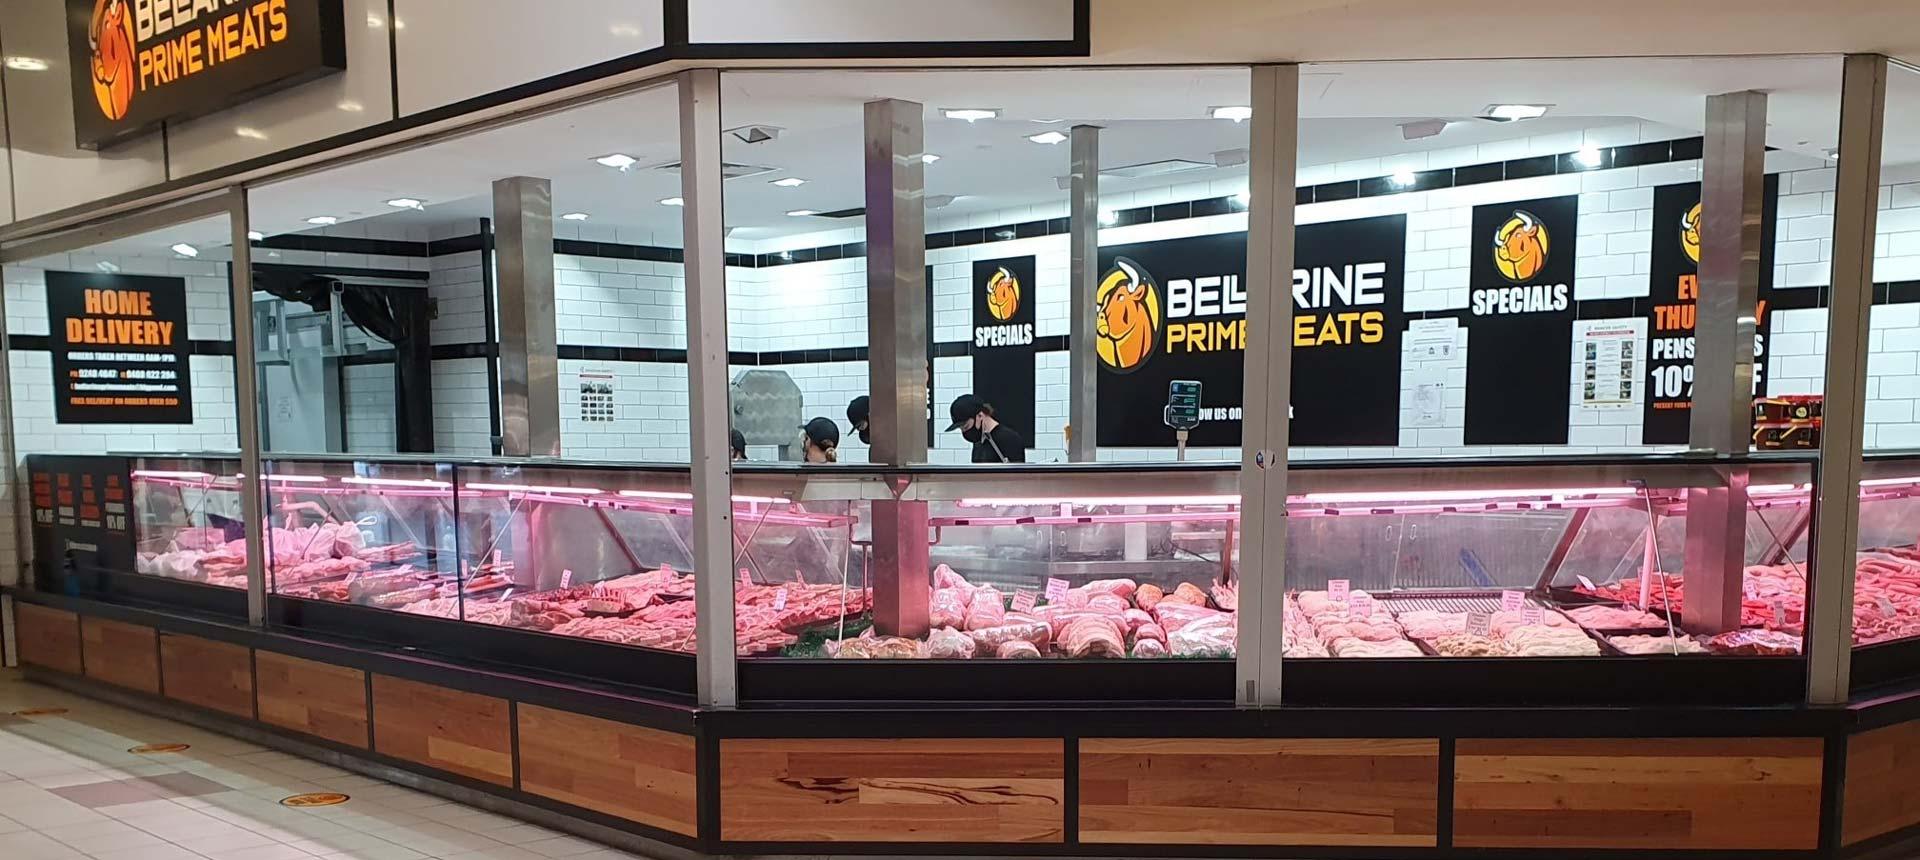 Bellarine Prime Meats